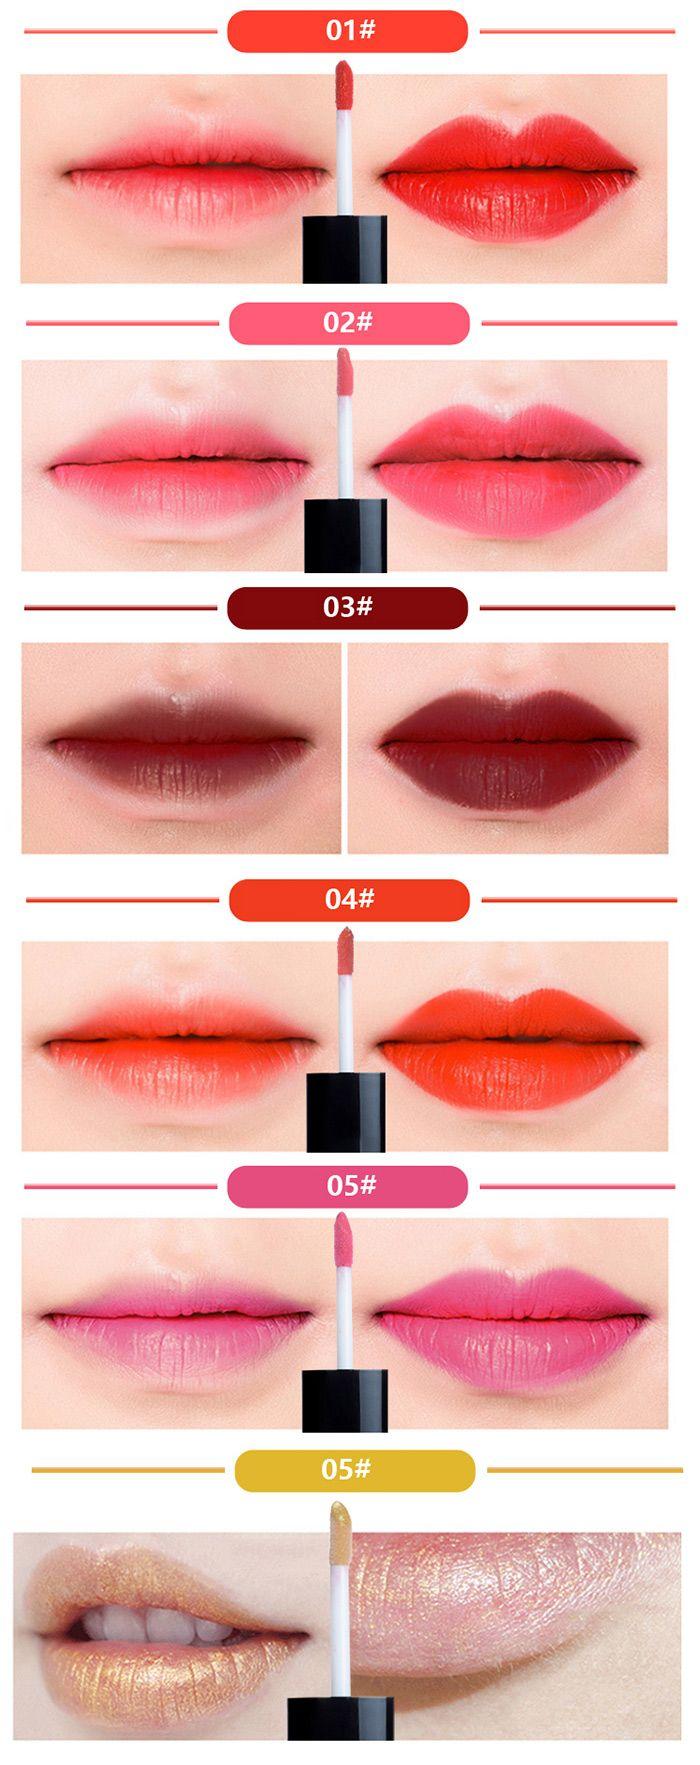 Long Lasting Moisture Not Stick Lip Glaze